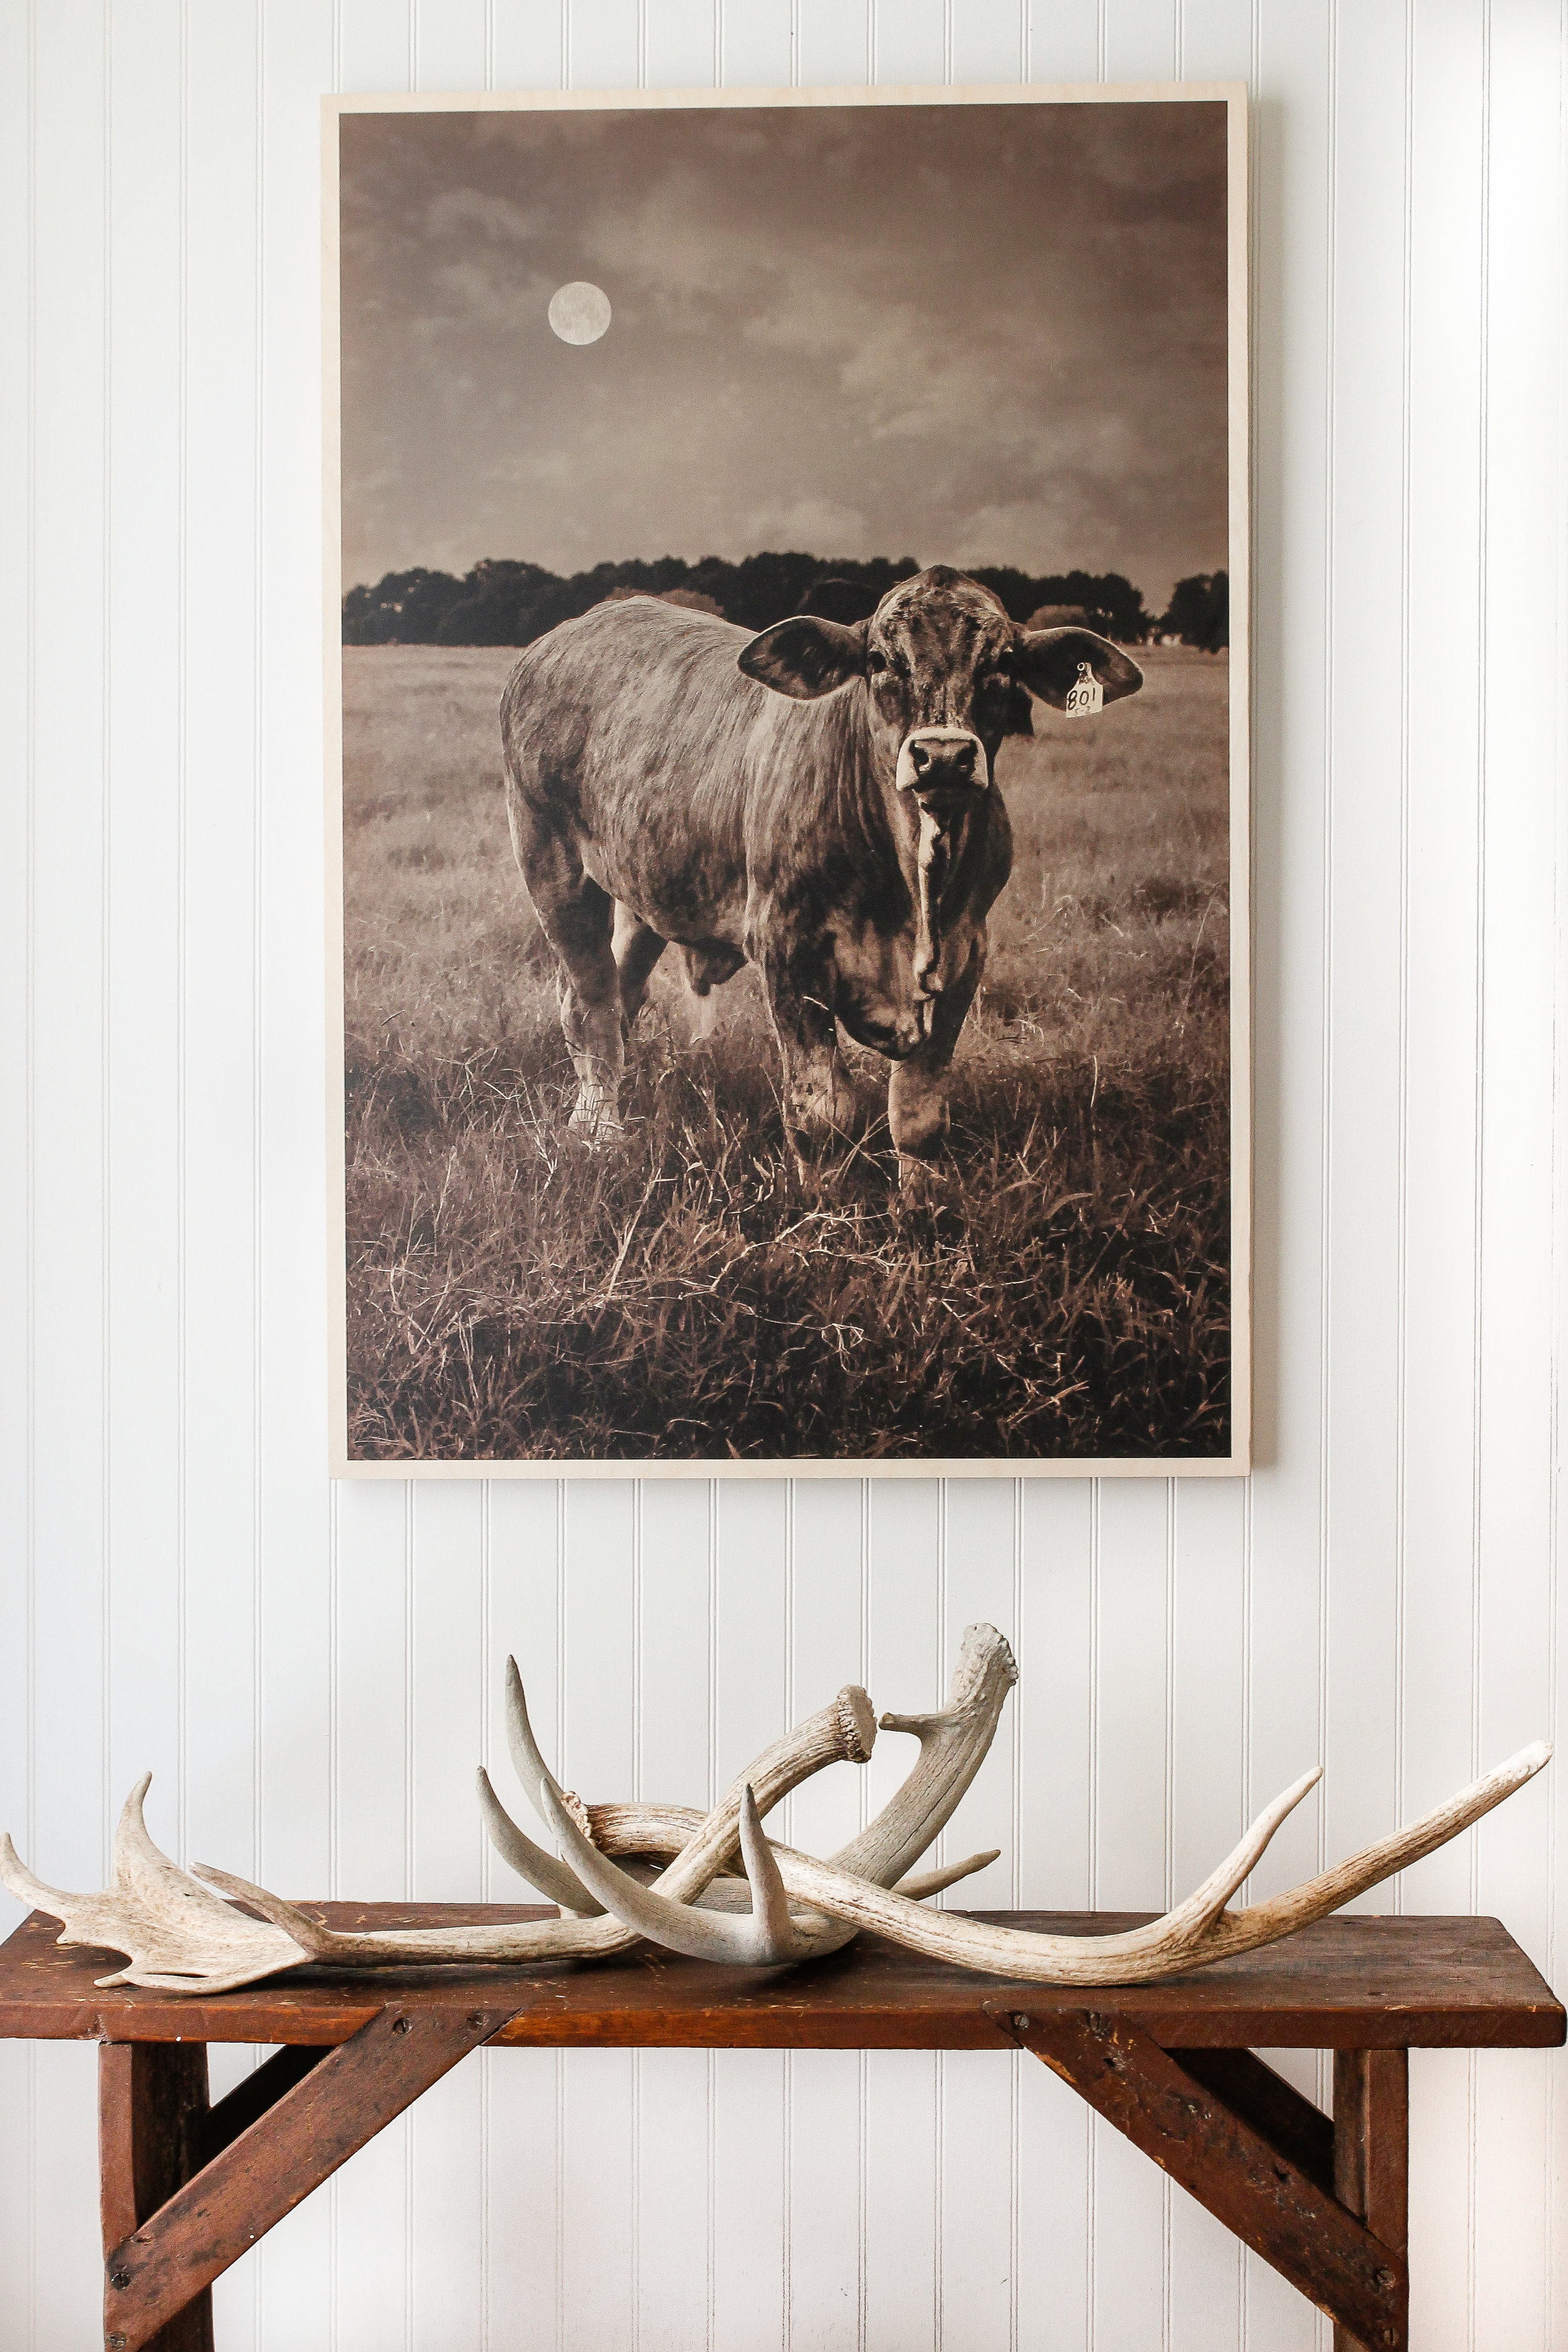 Cow Art Becki Griffin's Curious Details